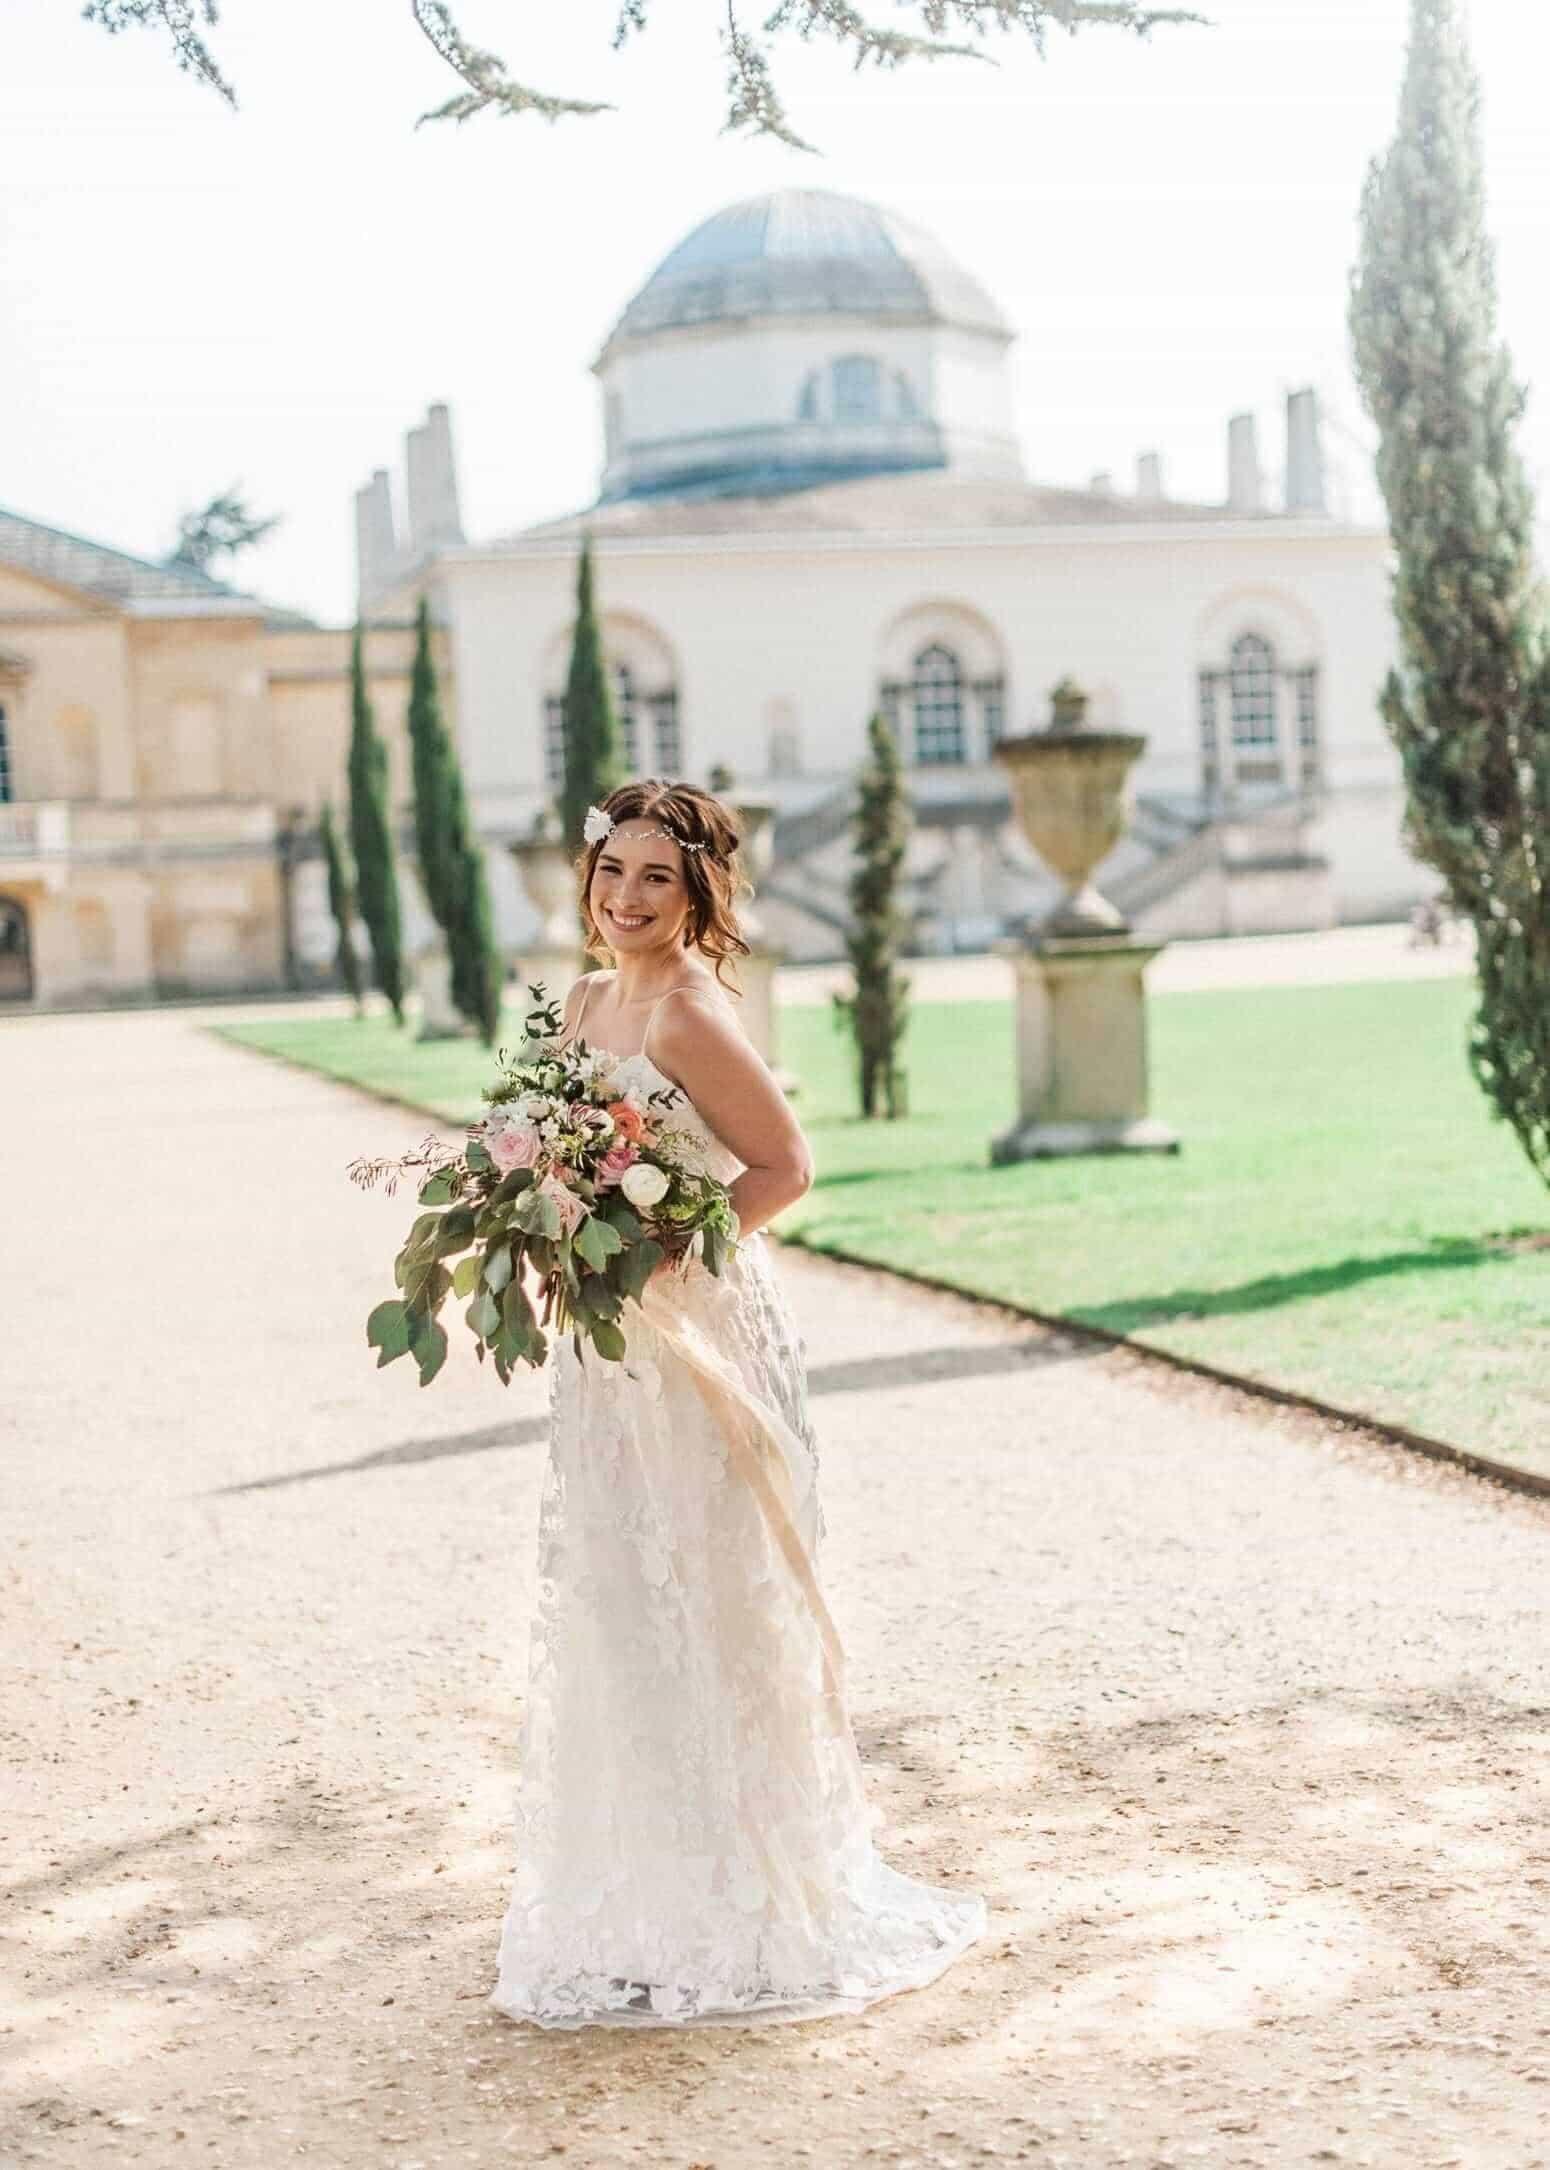 Kate Nielen Photography 114 - Luxury Wedding Gallery